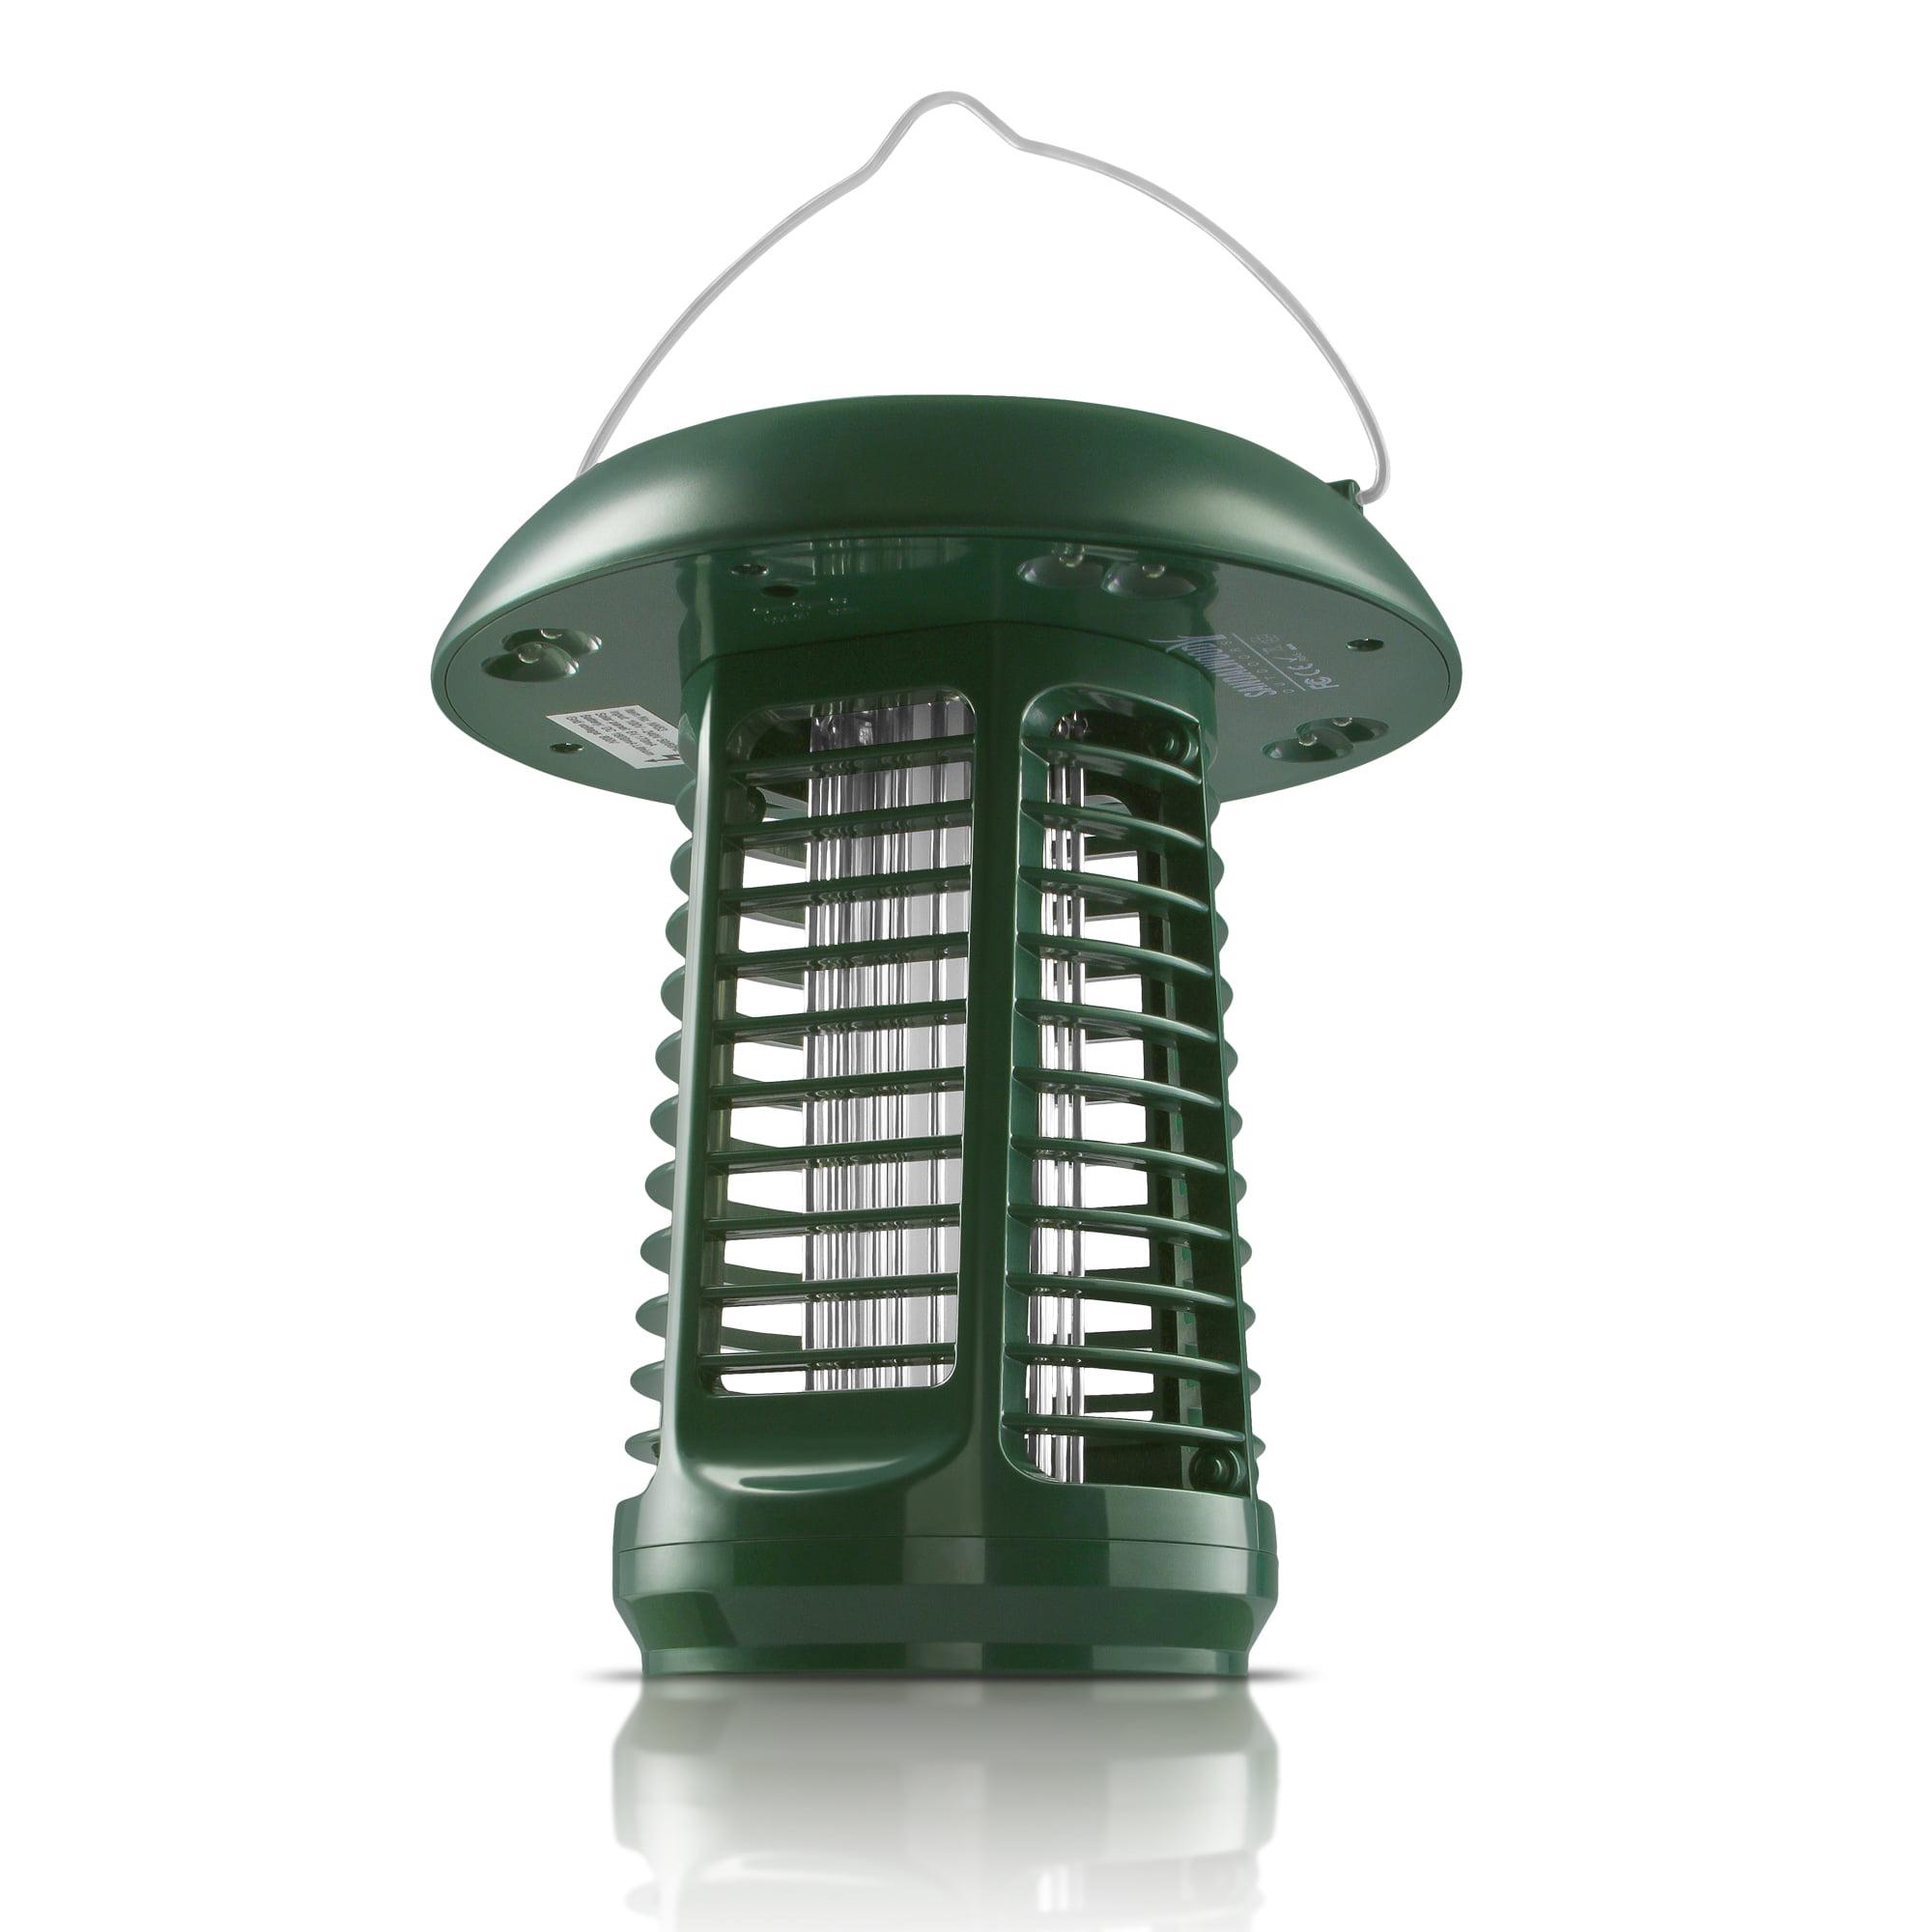 Sandalwood NK63 Solar-Powered UV Bug Zapper, Insect Killer & LED Garden Lamp – Included UL Adapter Enables Standard Charging